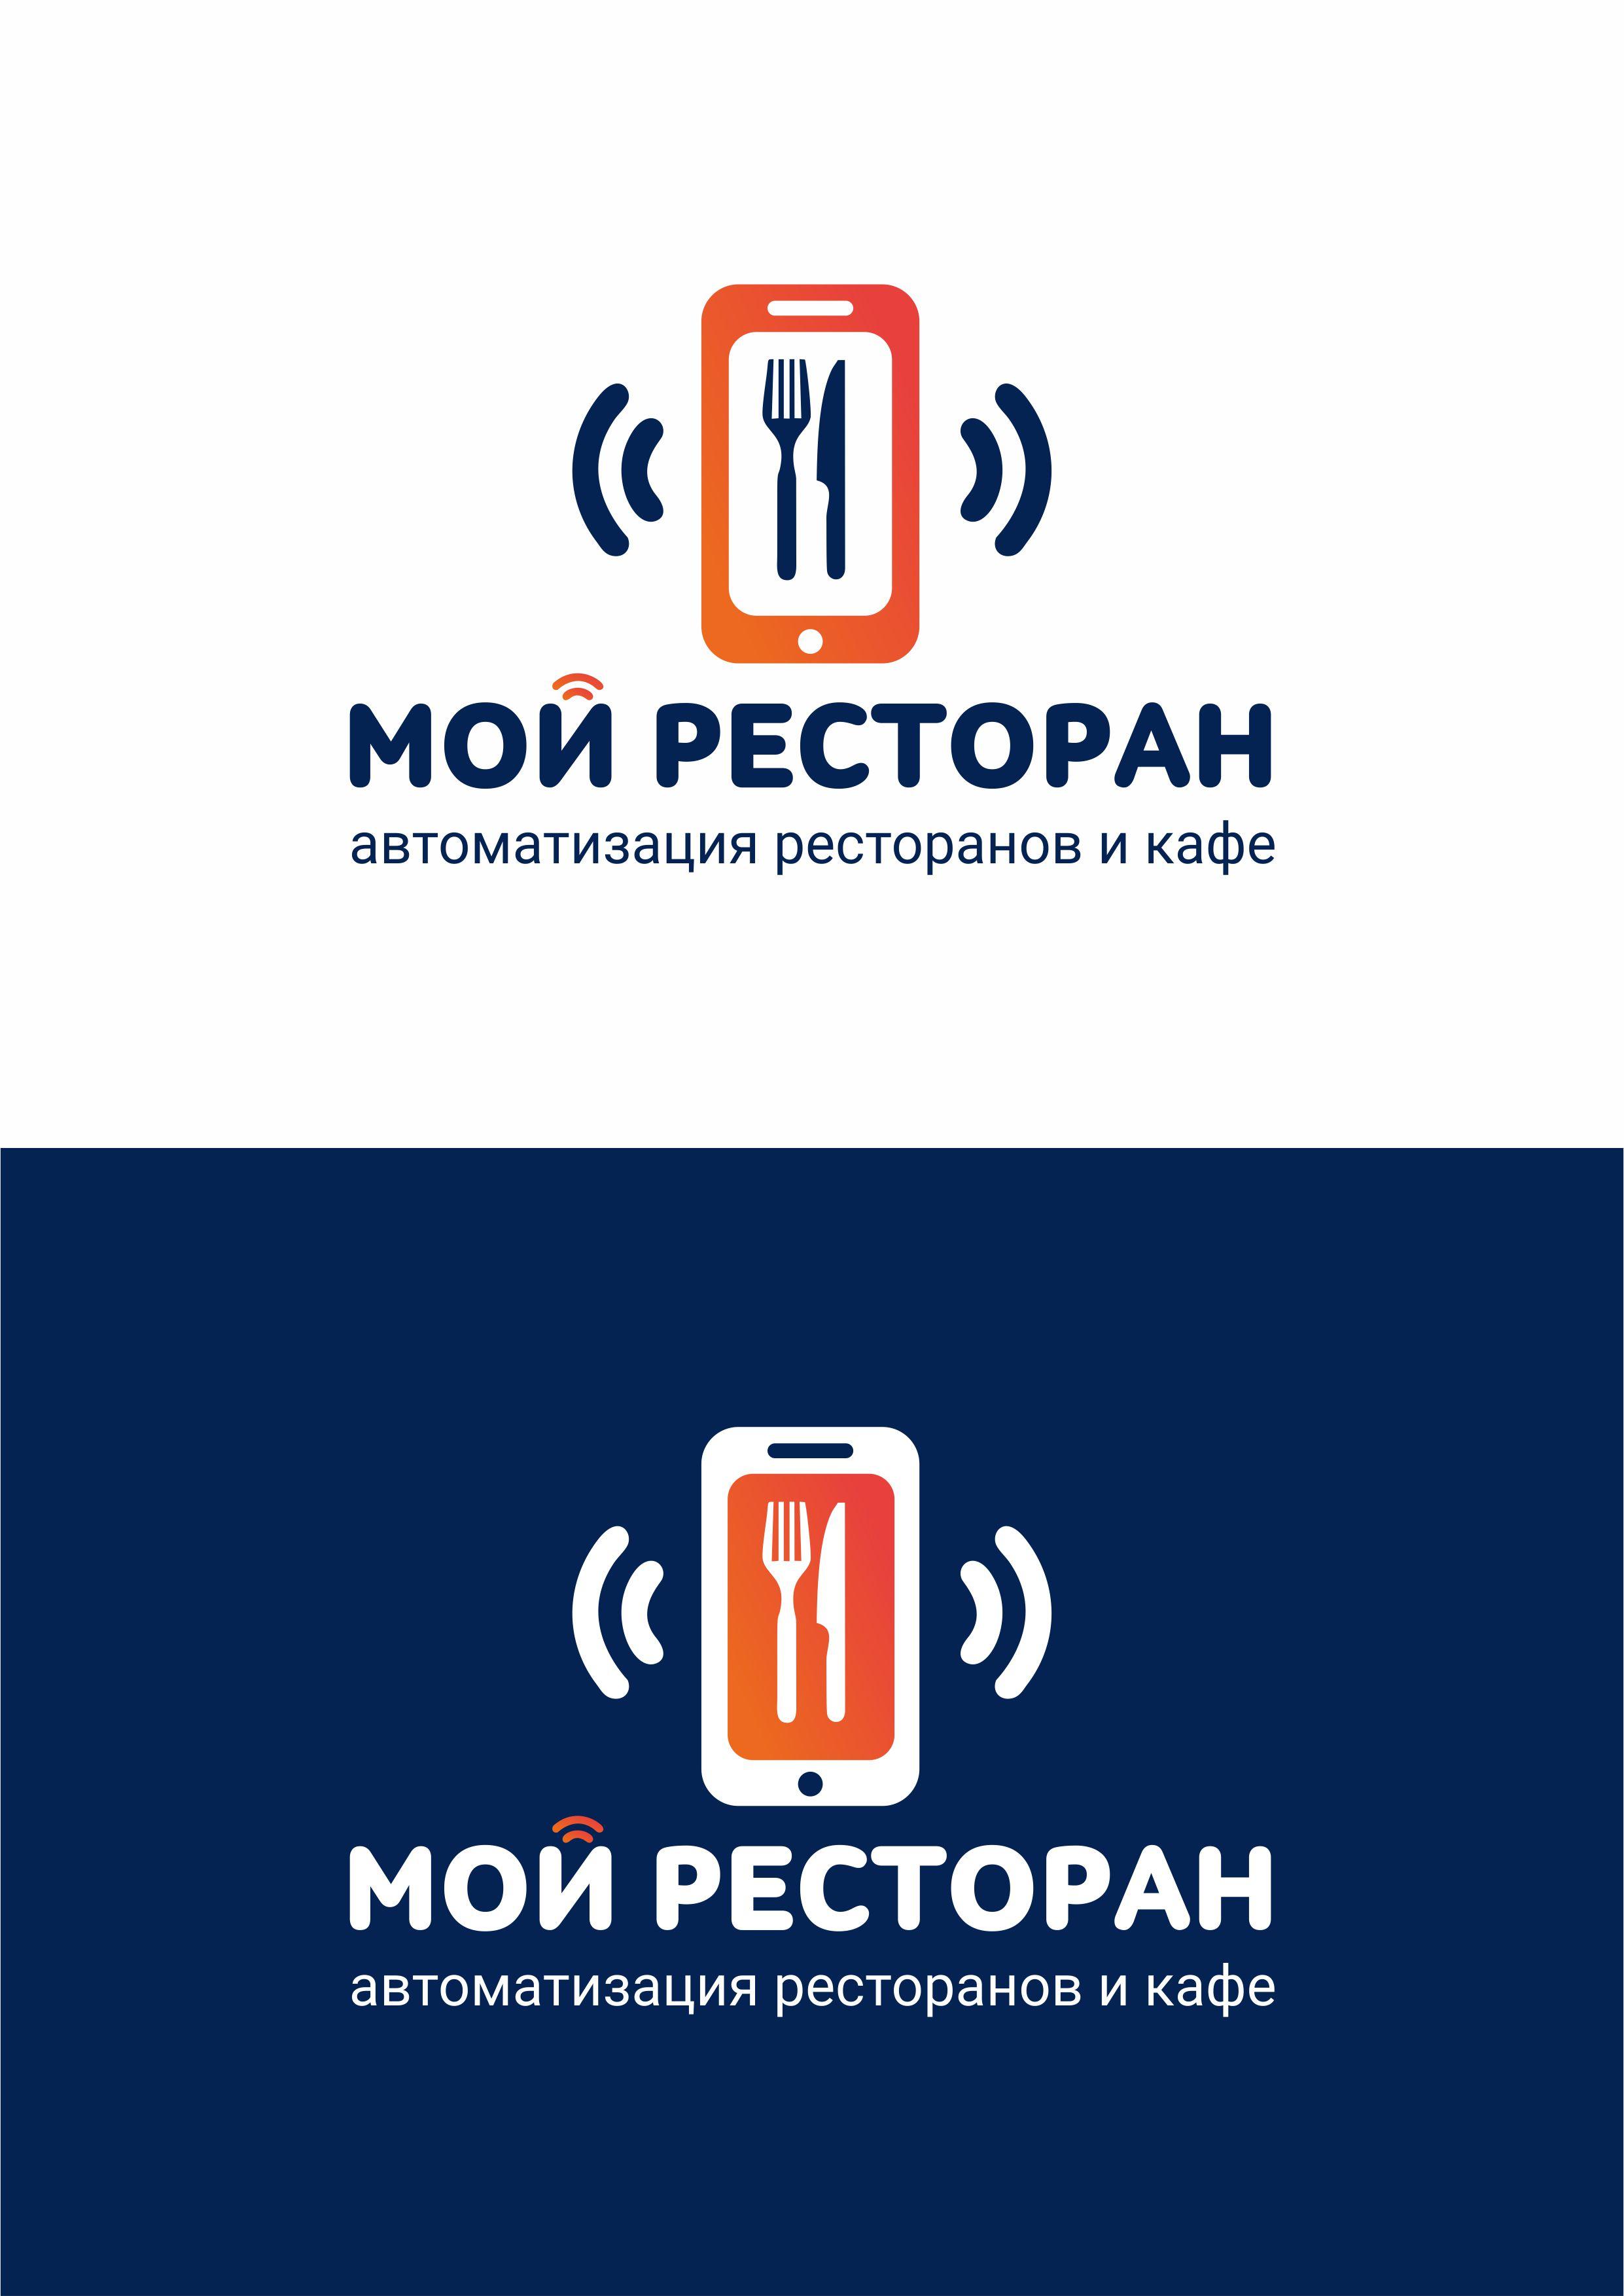 Разработать логотип и фавикон для IT- компании фото f_4235d5326969a467.jpg